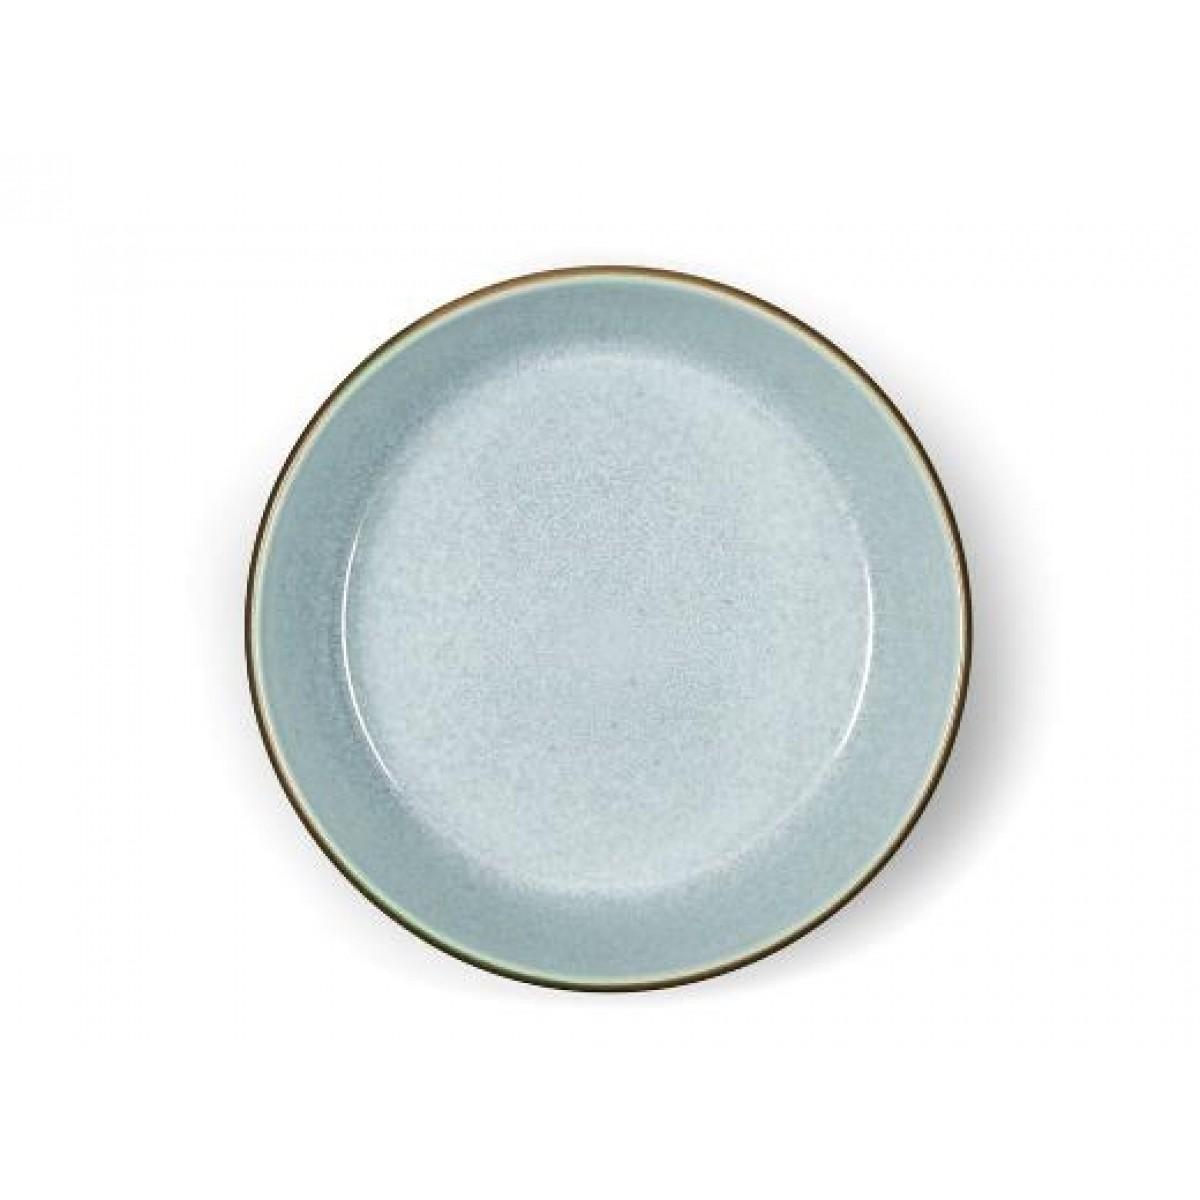 BITZ Suppeskål gastro 18 cm grå/lysblå